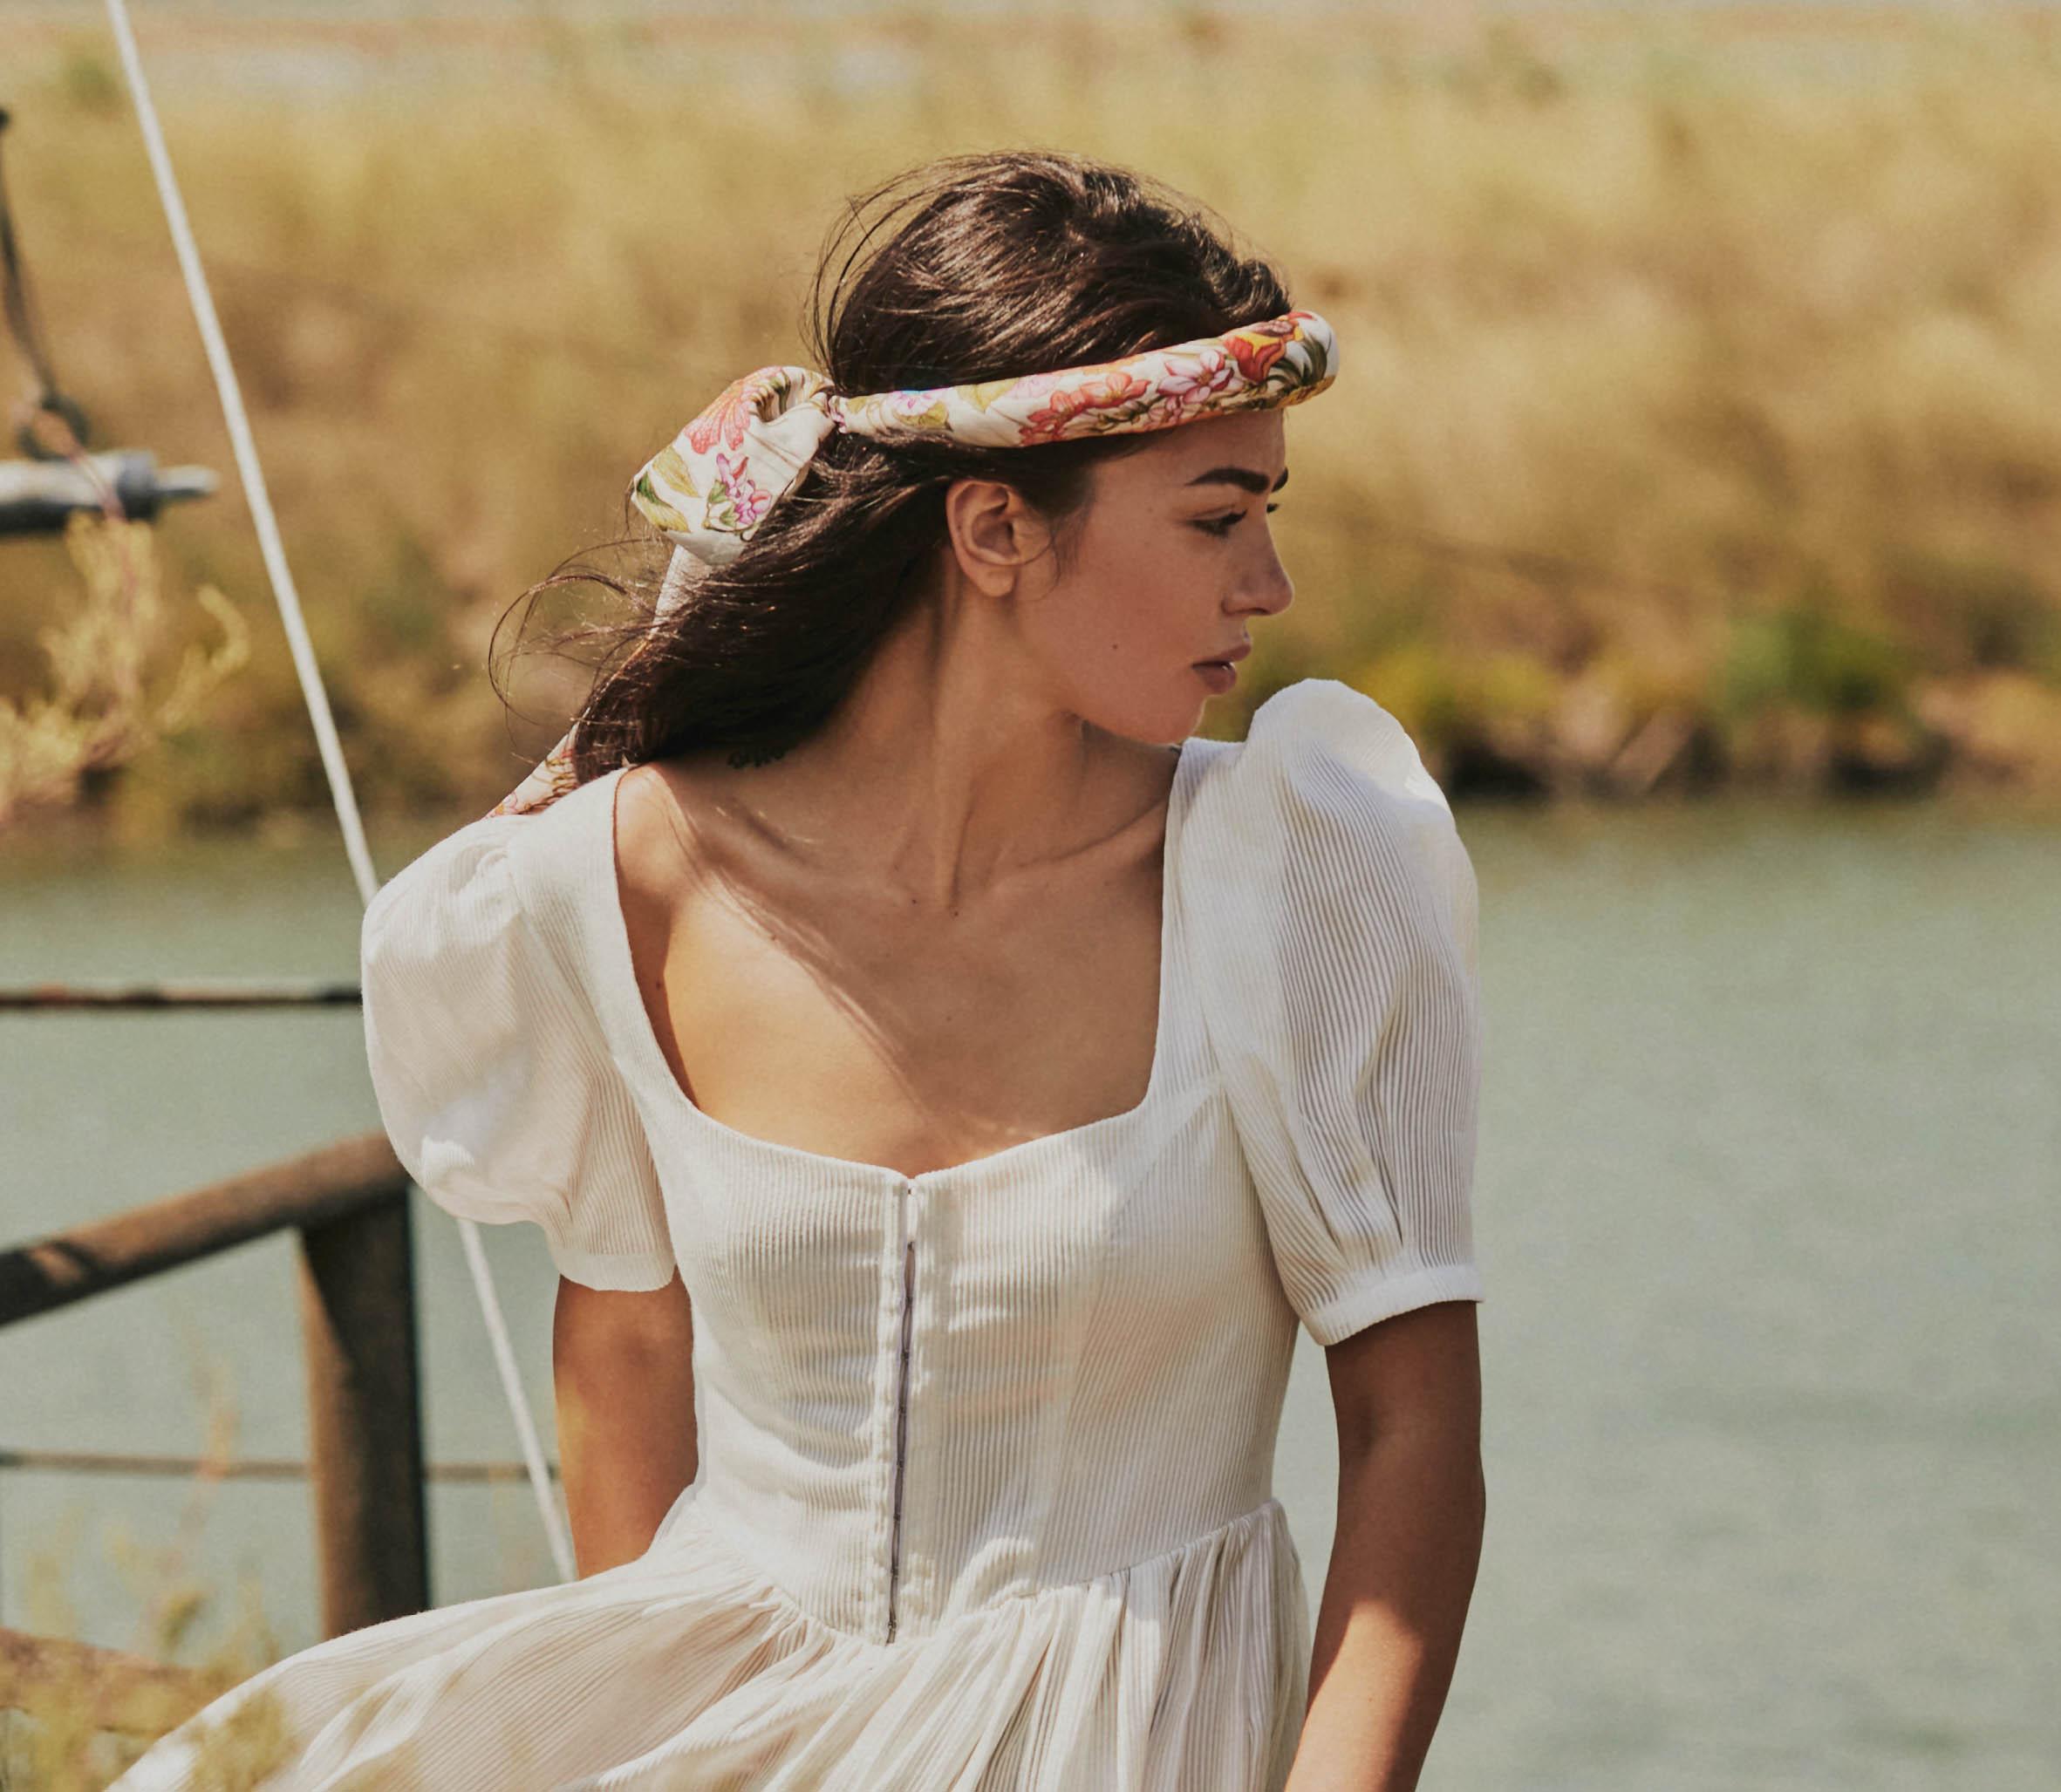 The Dressing Screen women clothing